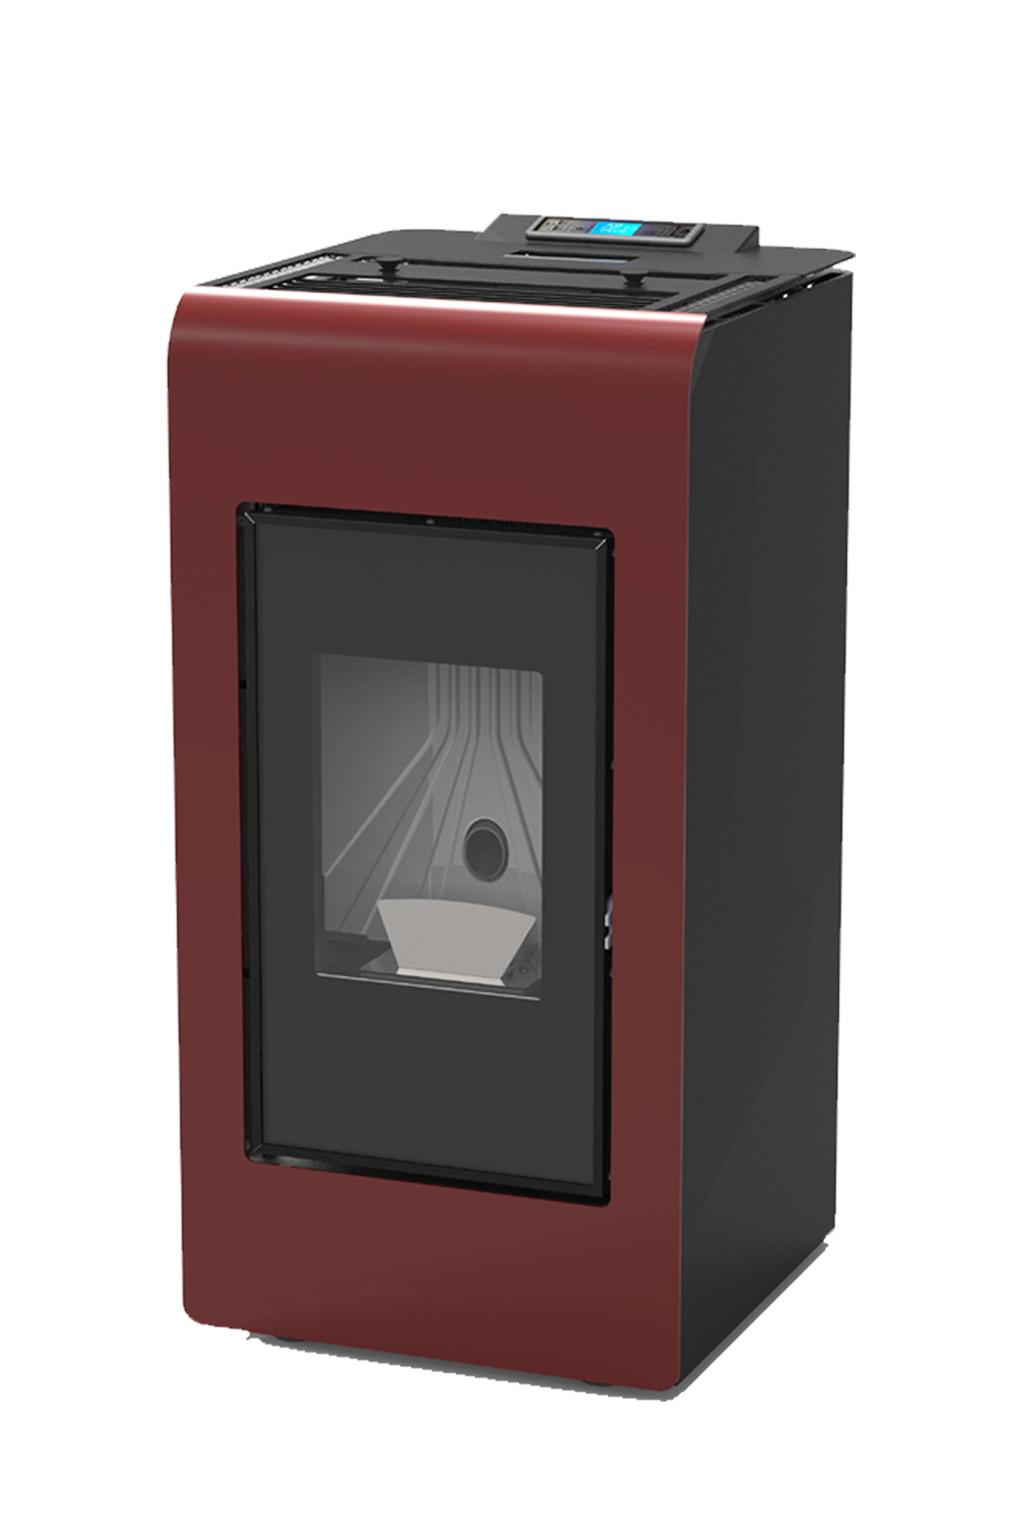 Cayenne Pro rood-8 kW - warmte voor 60m2